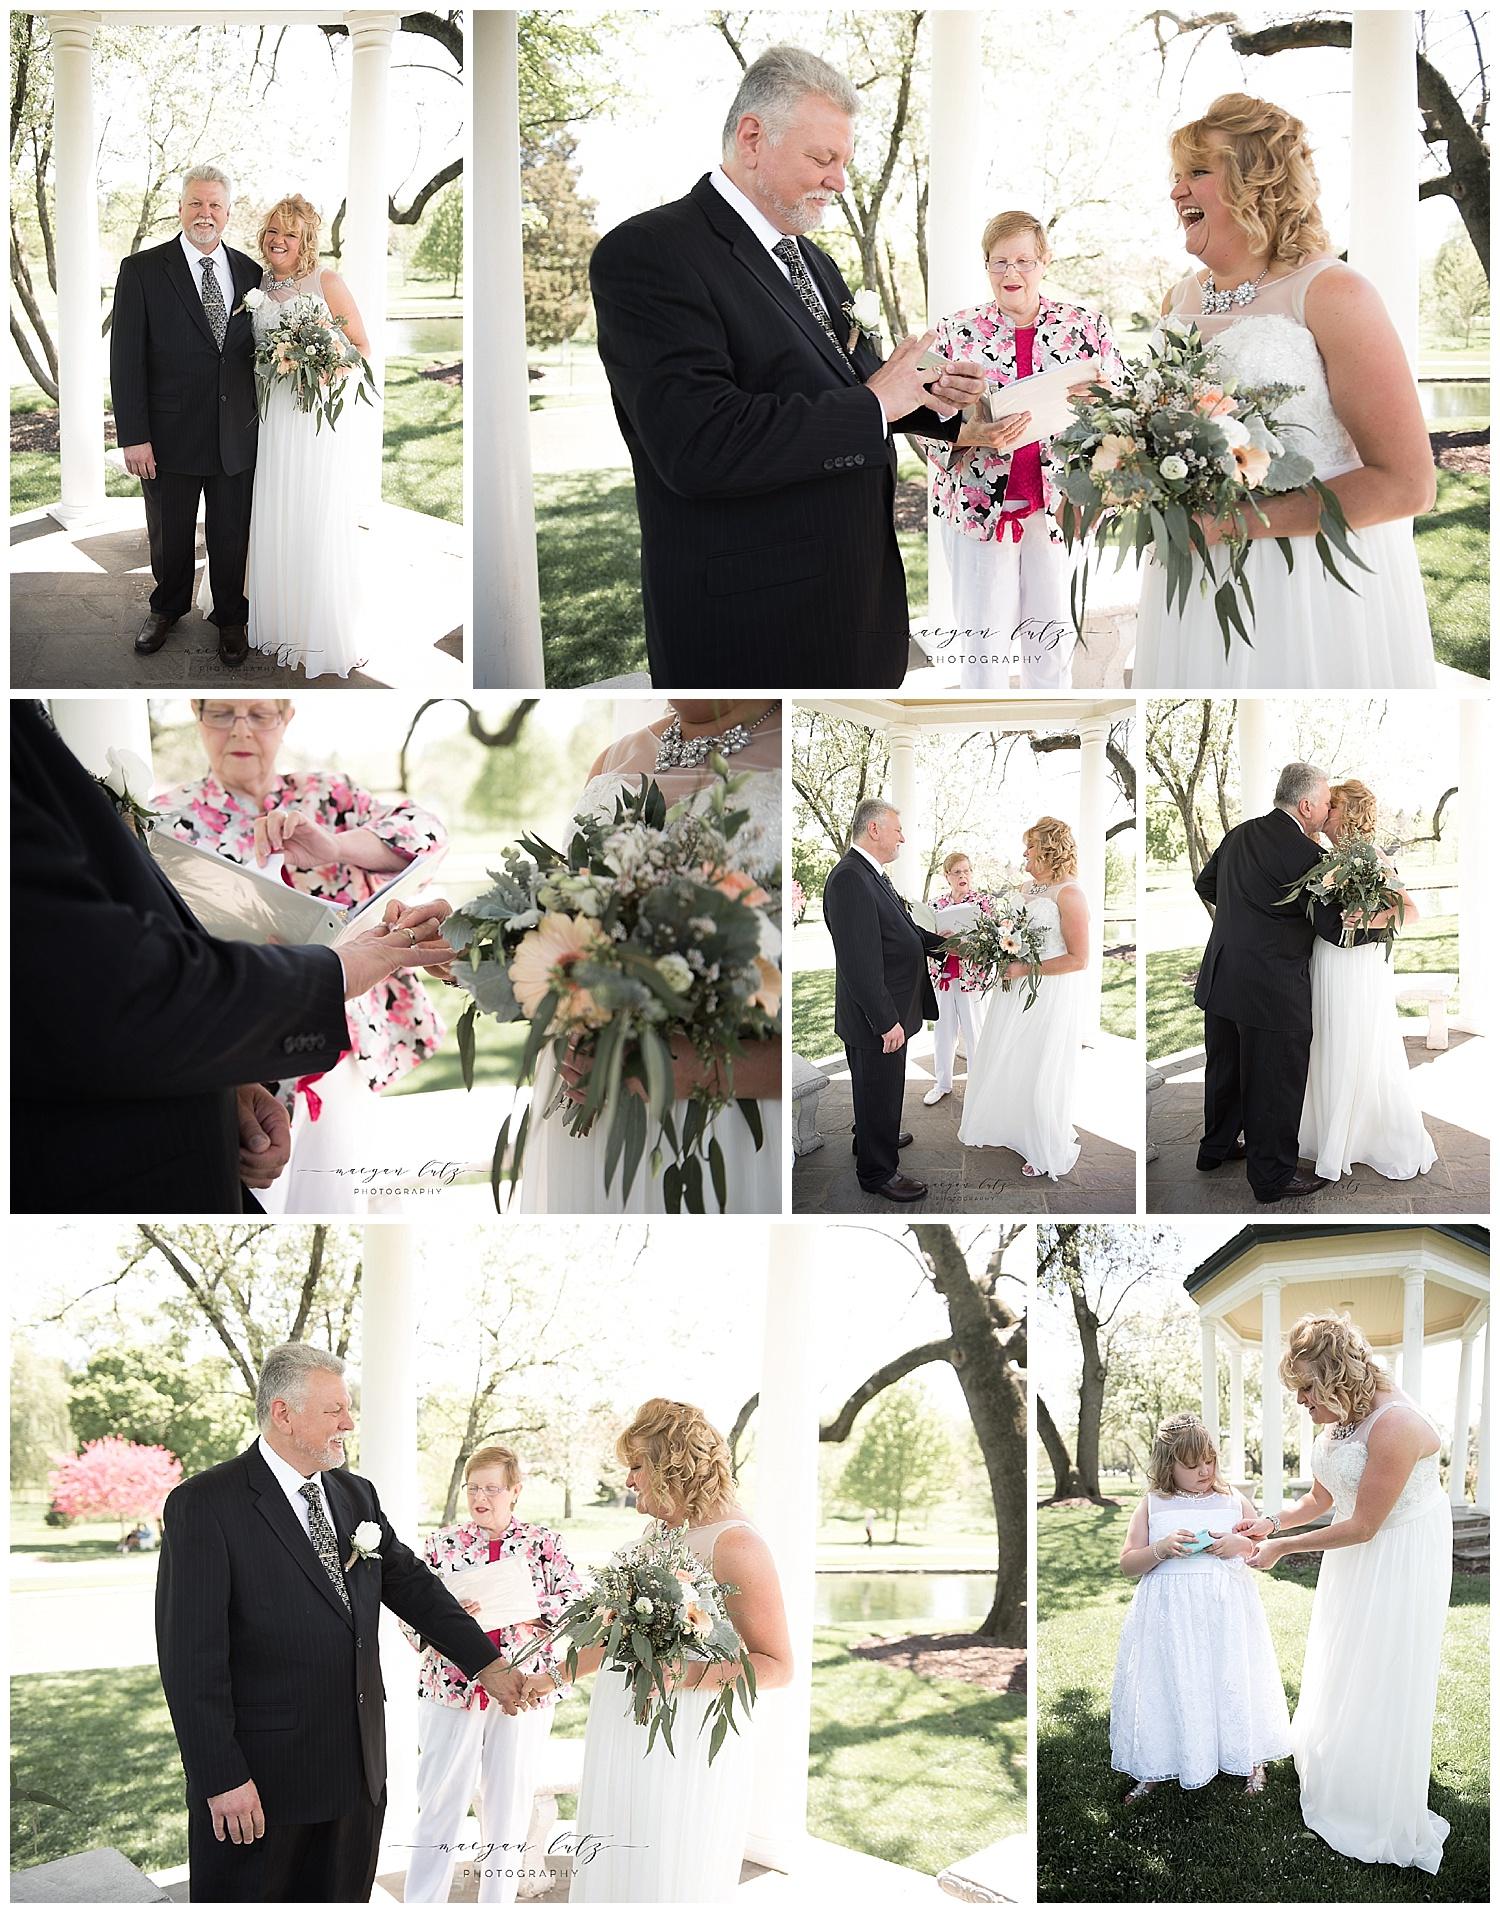 Wedding Photographer in Northeast and Scranton PA